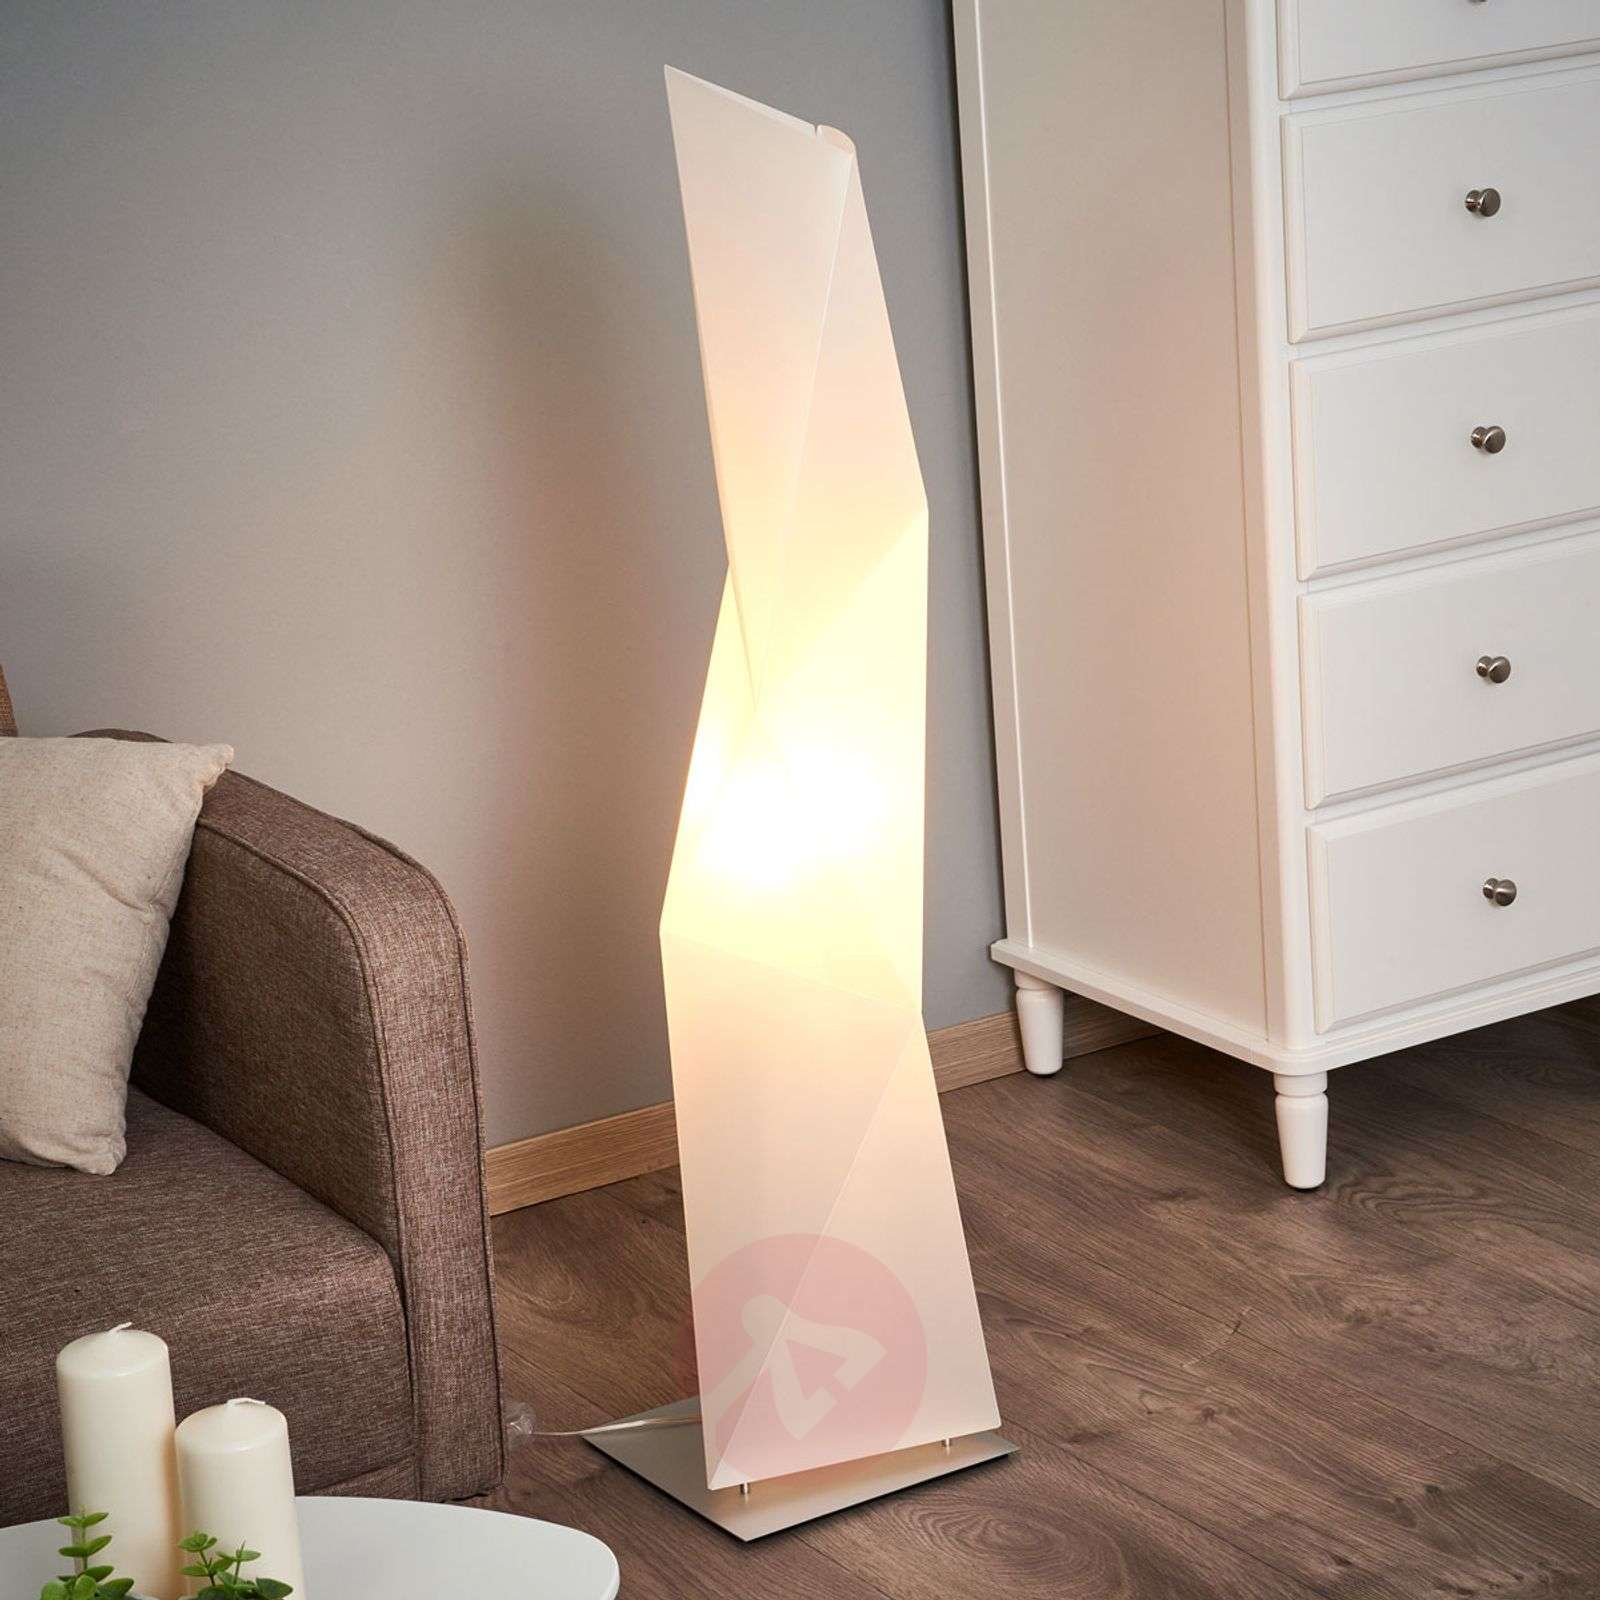 Design-lattiavalaisin Diamond, 111 cm-8503227-01